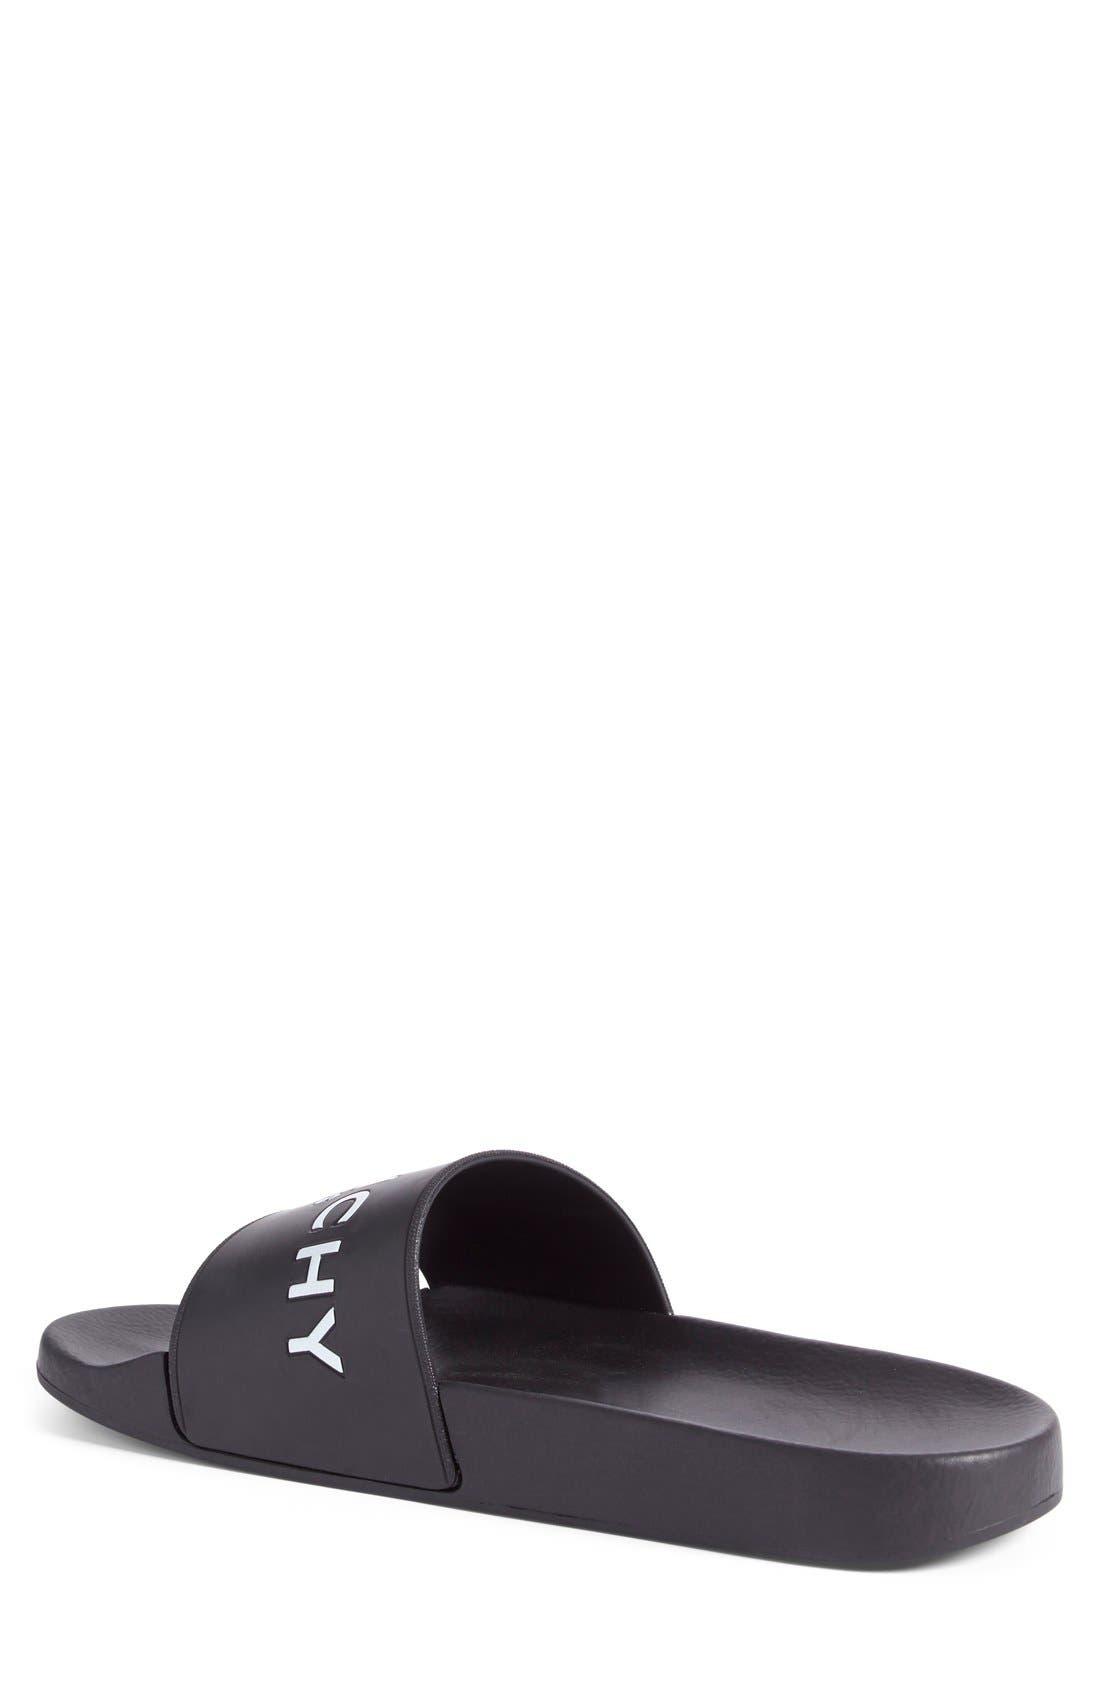 Slide Sandal,                             Alternate thumbnail 2, color,                             Black Leather